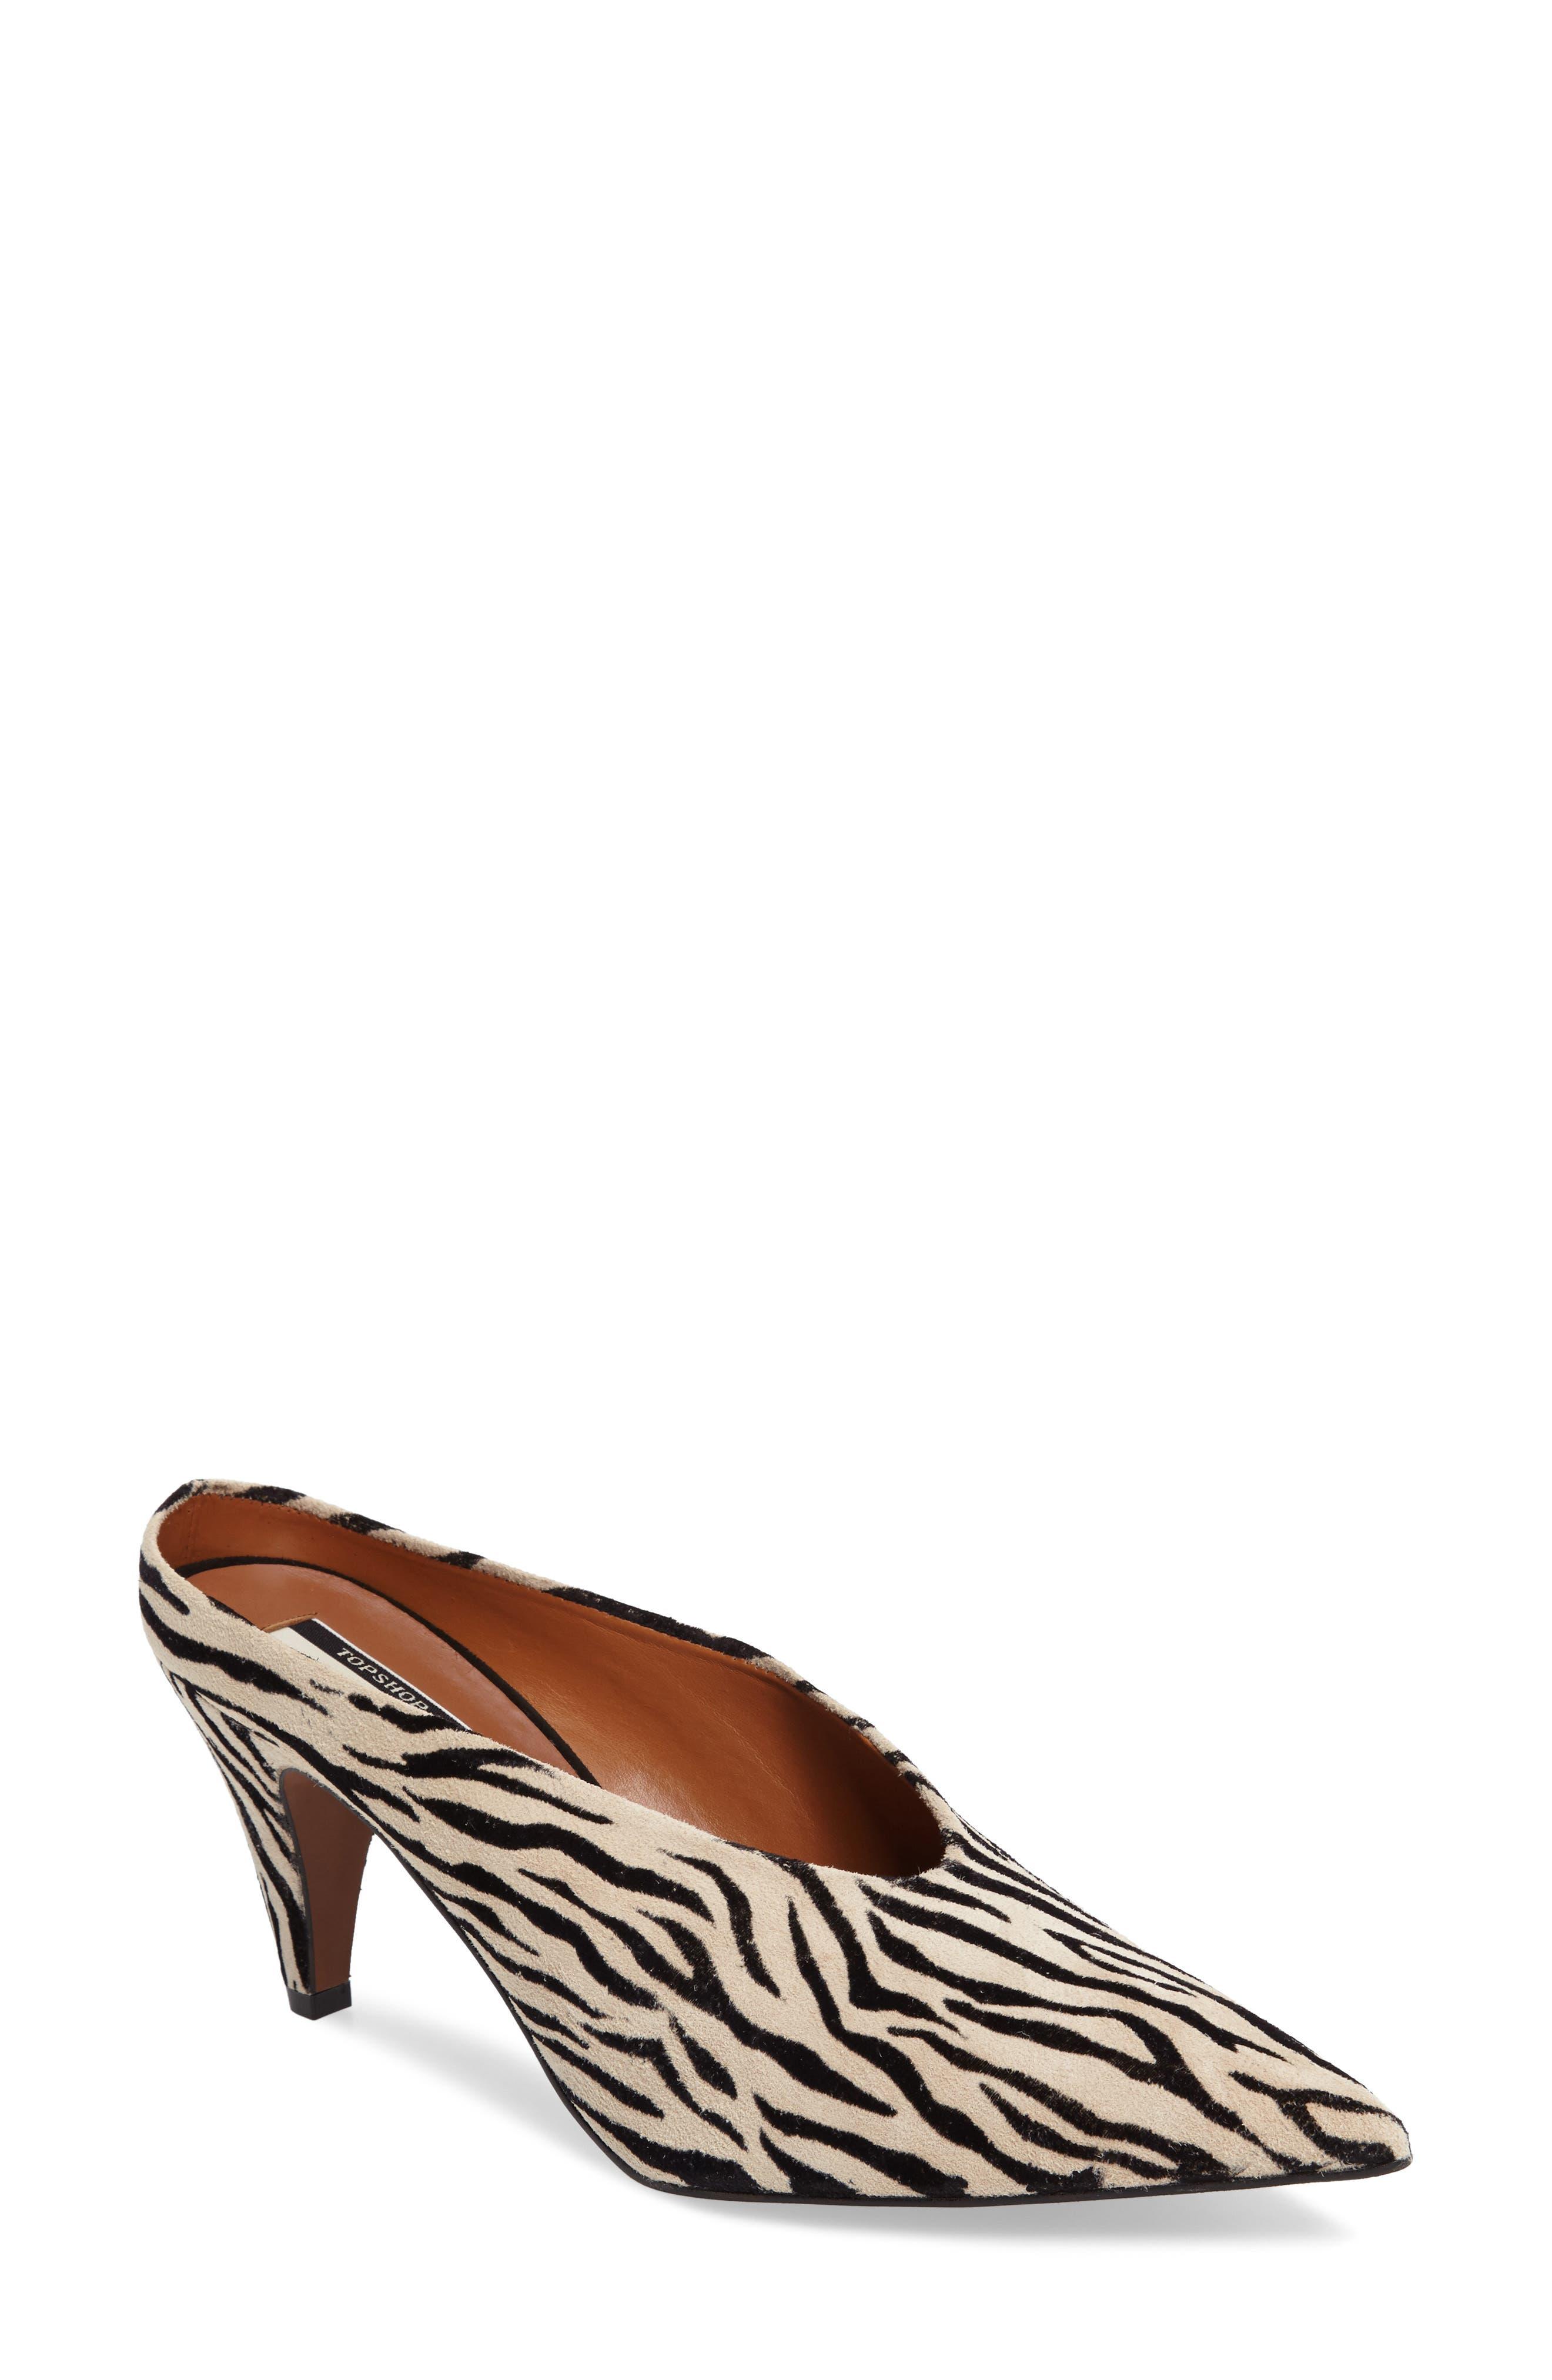 Juicy Pointy Toe Pump,                             Main thumbnail 1, color,                             Zebra Print Leather